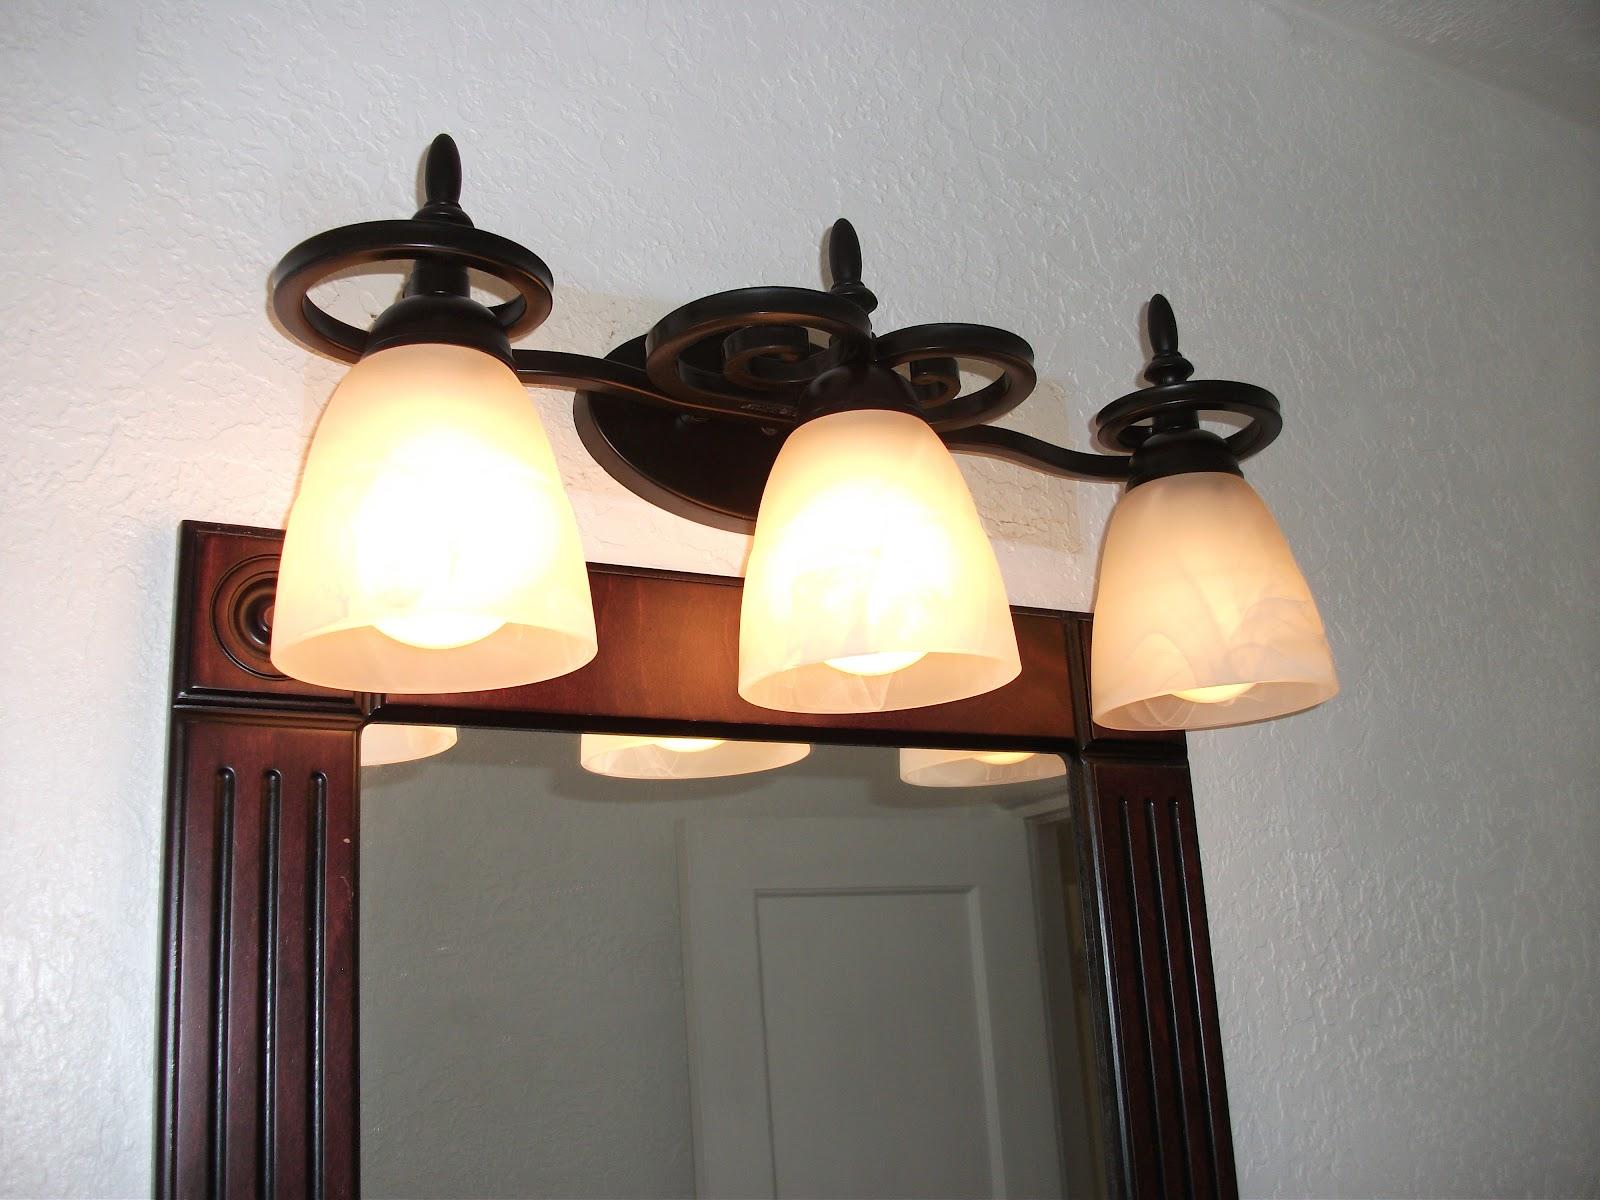 Bathroom Lights Costco personality is preferred: costco bathroom lights